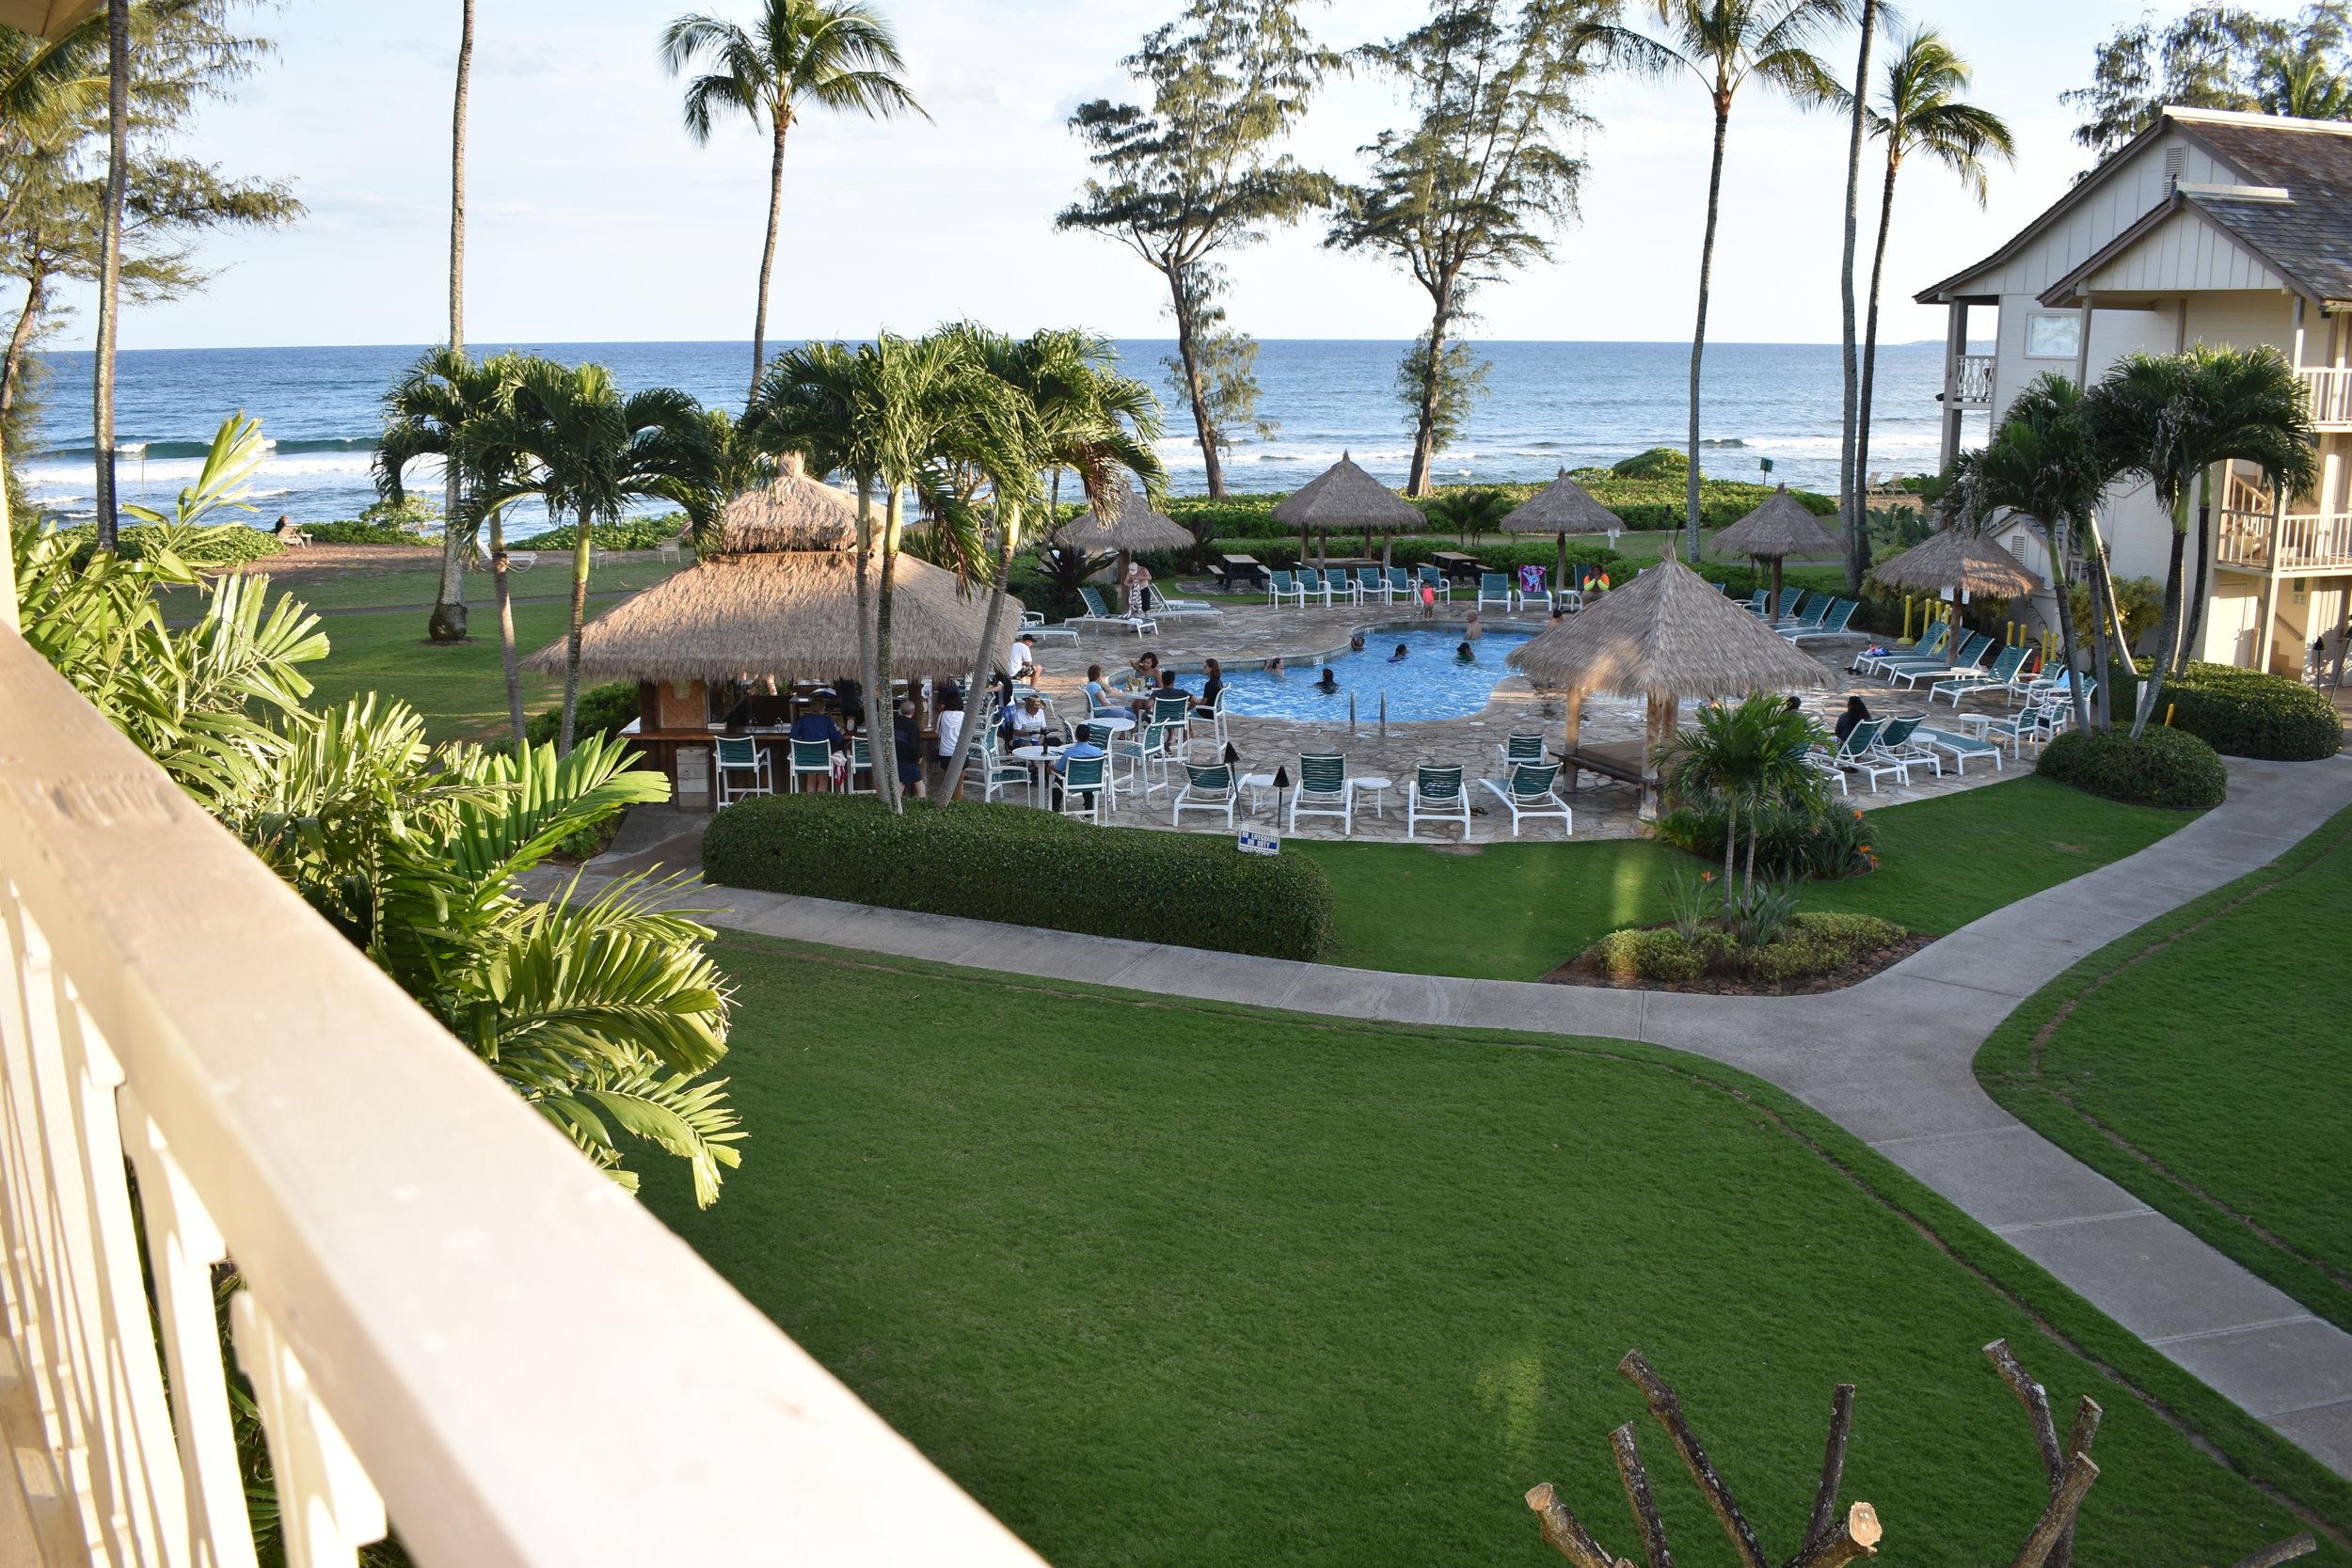 views-from-aston-islander-on-the-beach-in-kauai